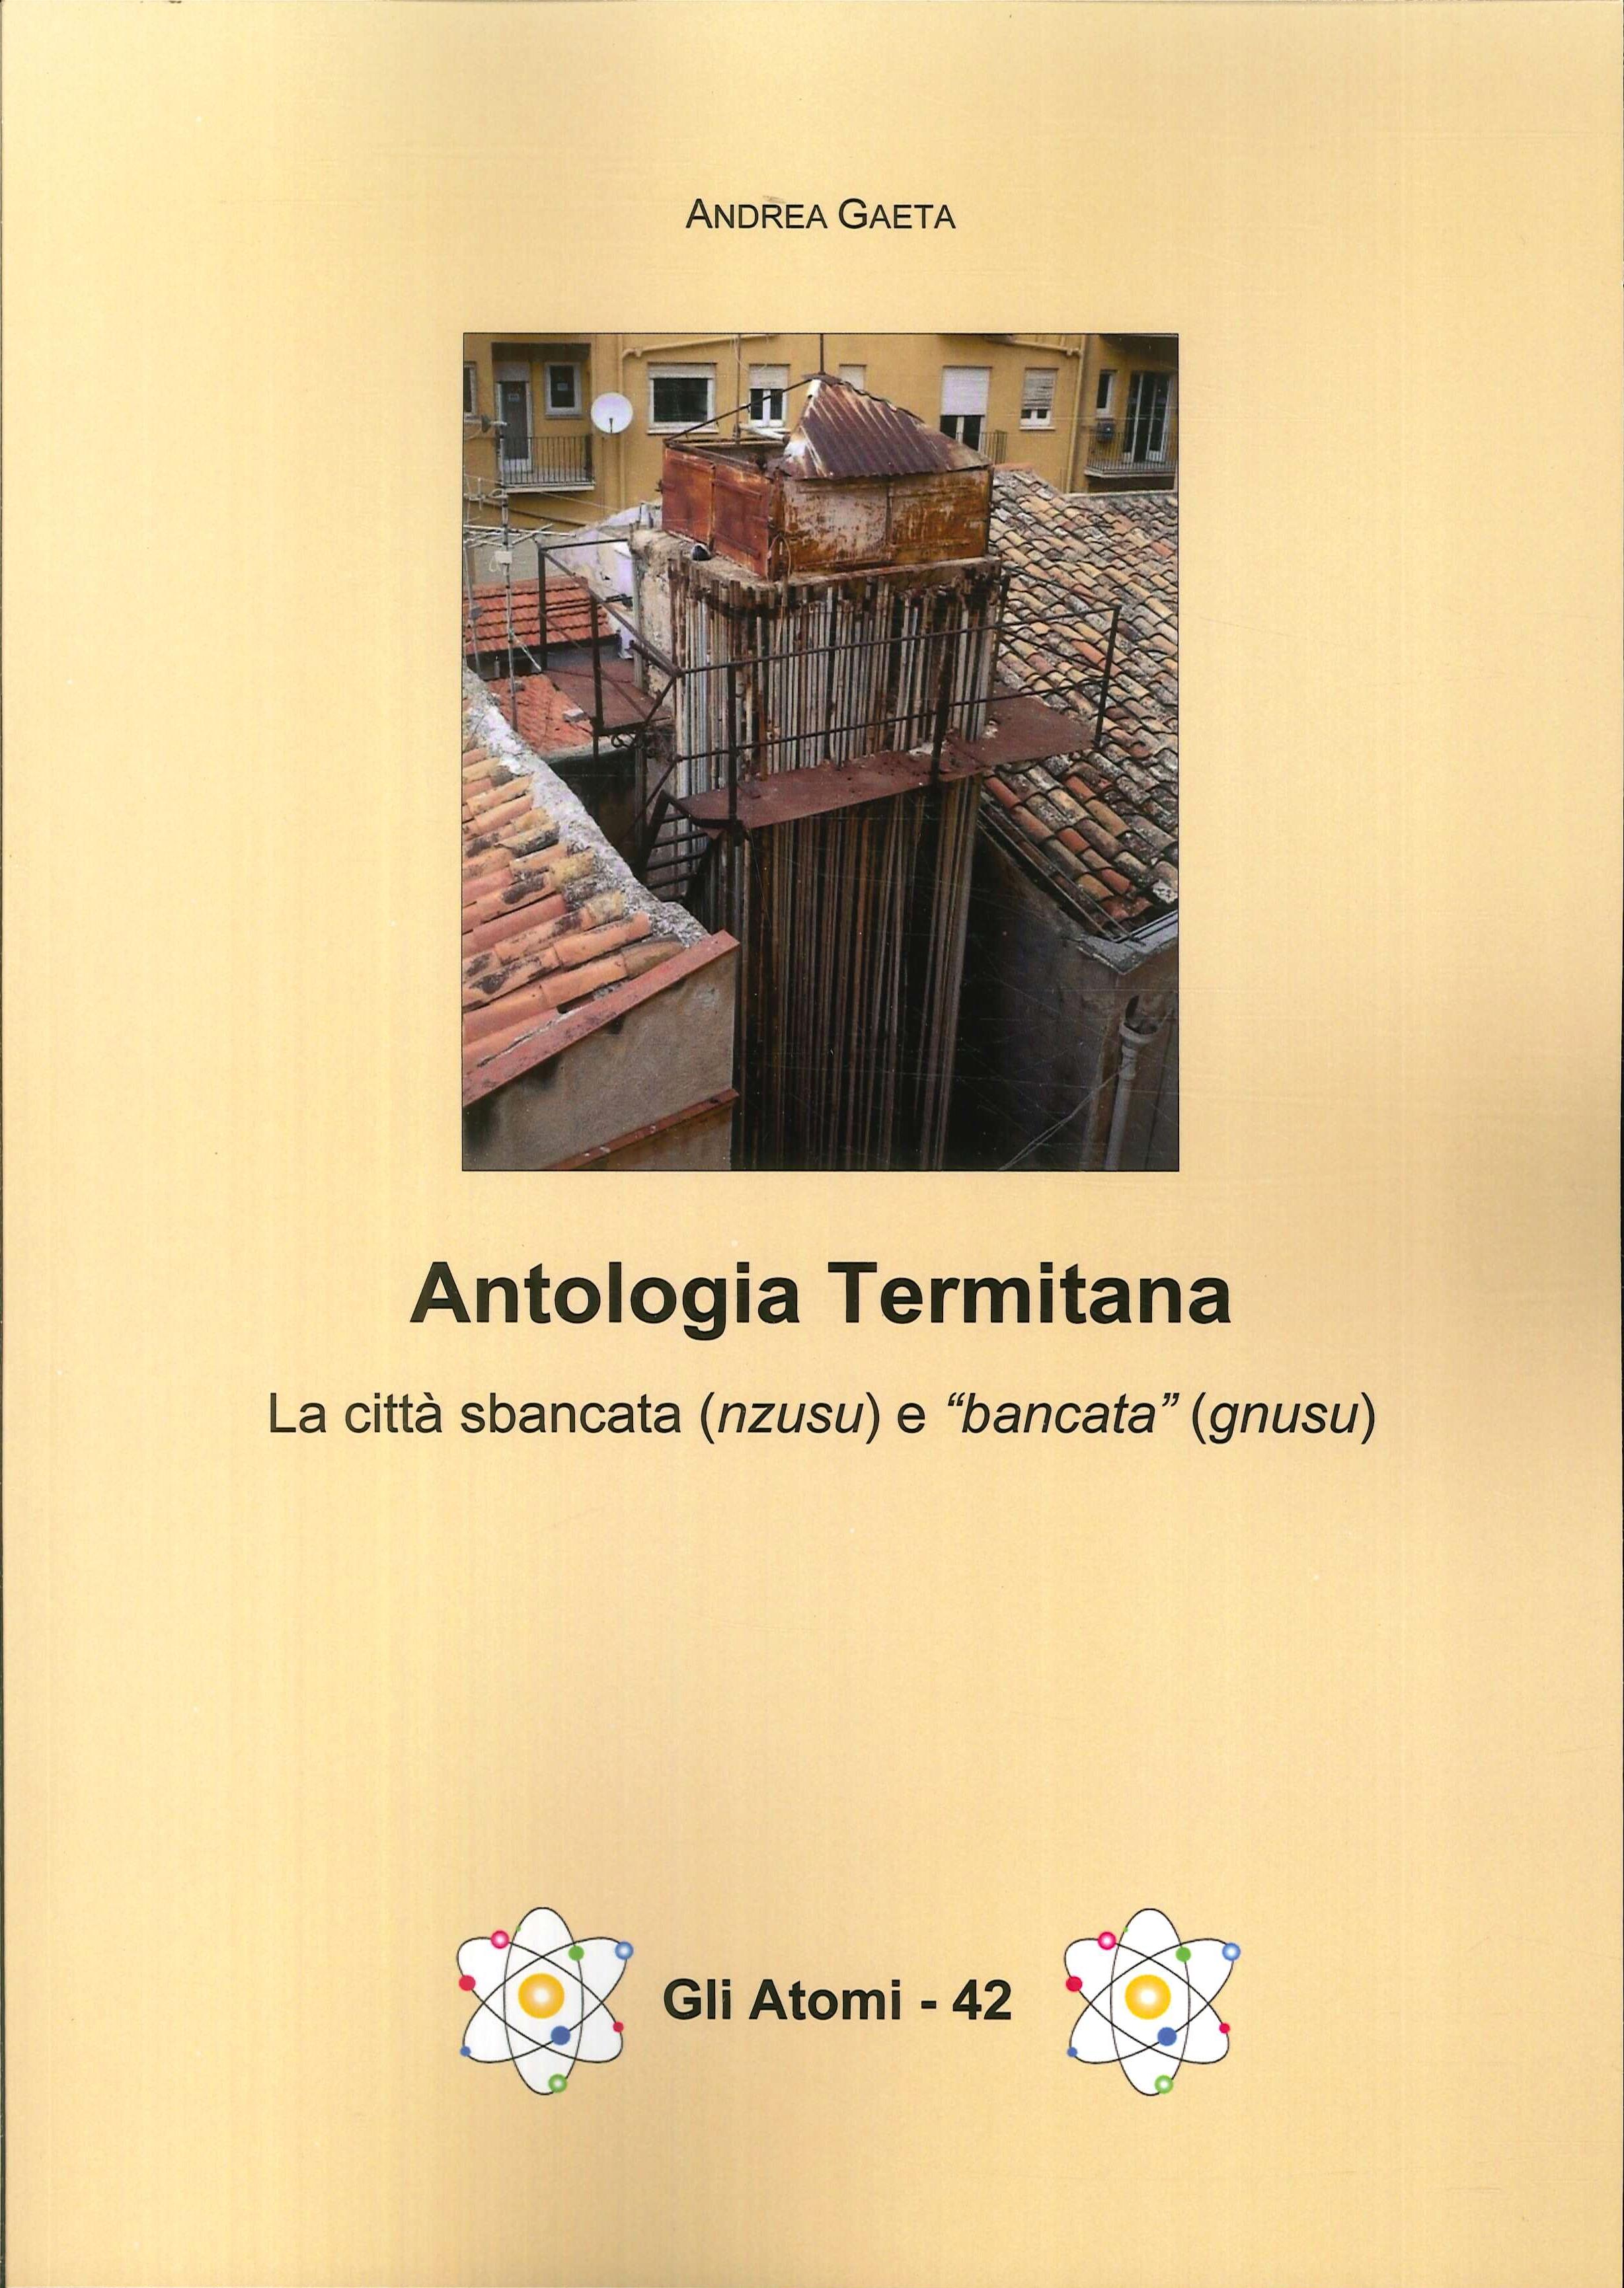 Antologia termitana. La città sbancata (nzusu) e